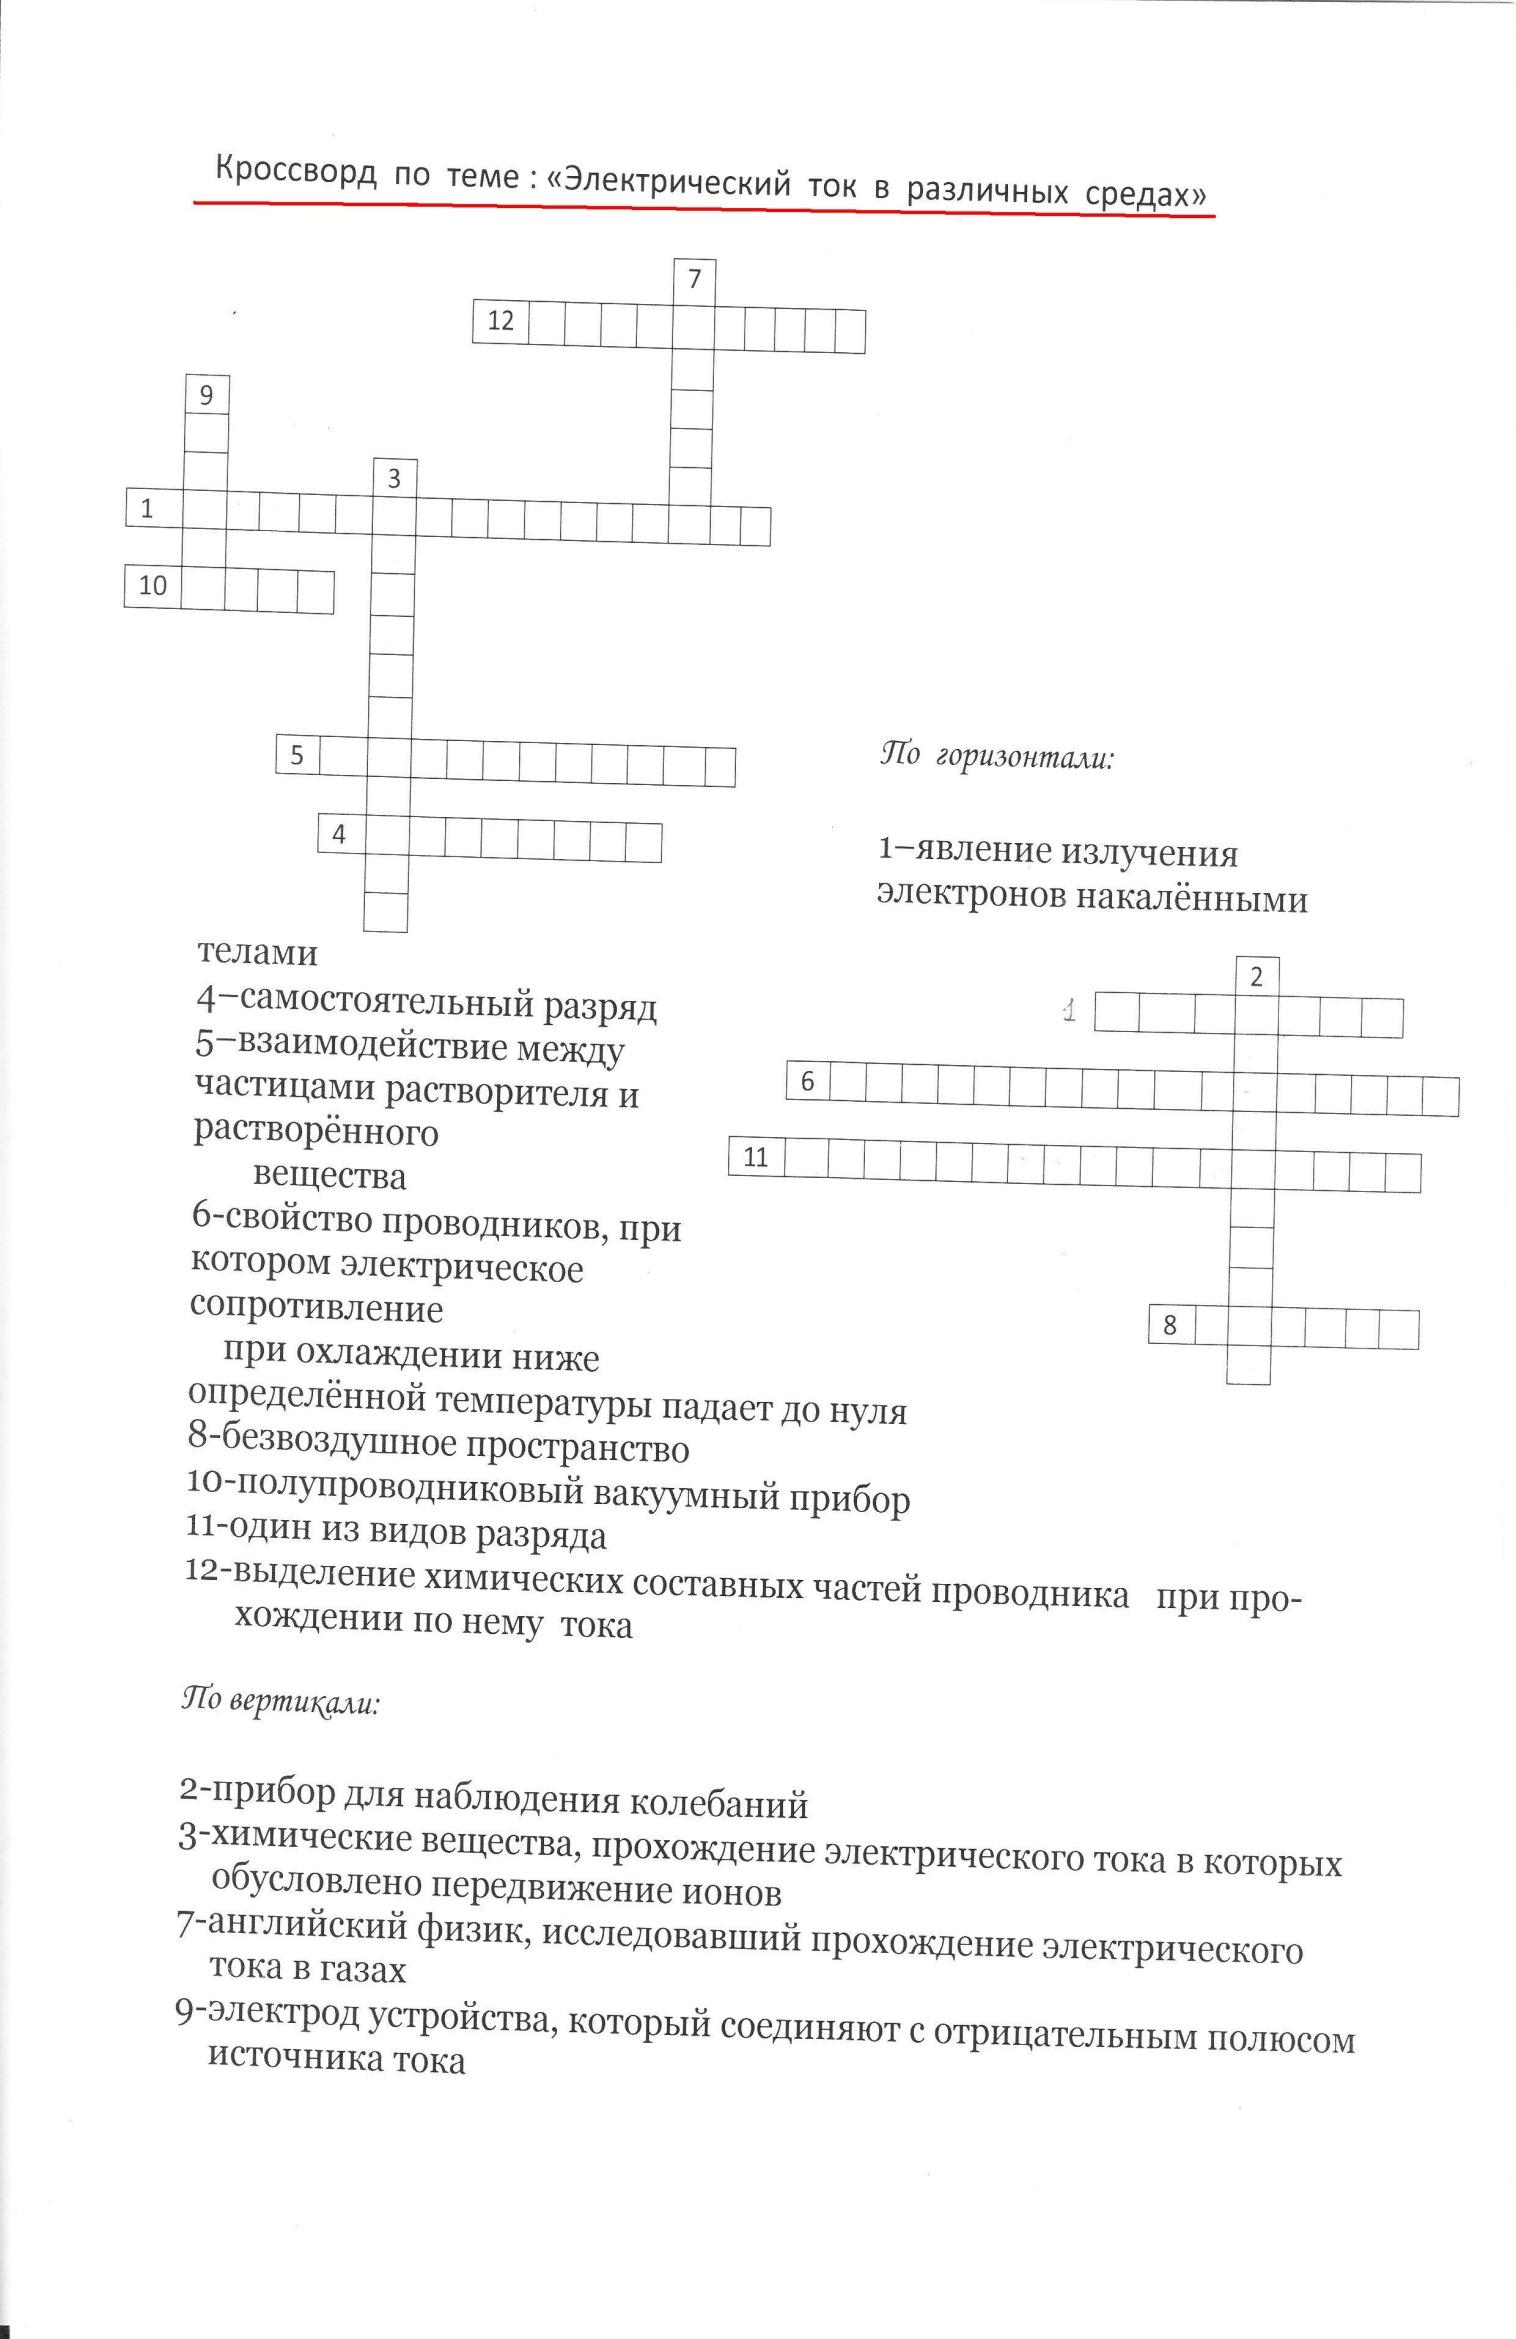 C:\Documents and Settings\UserXP\Мои документы\Мои рисунки\MP Navigator EX\кроссворды\IMG_0006.jpg